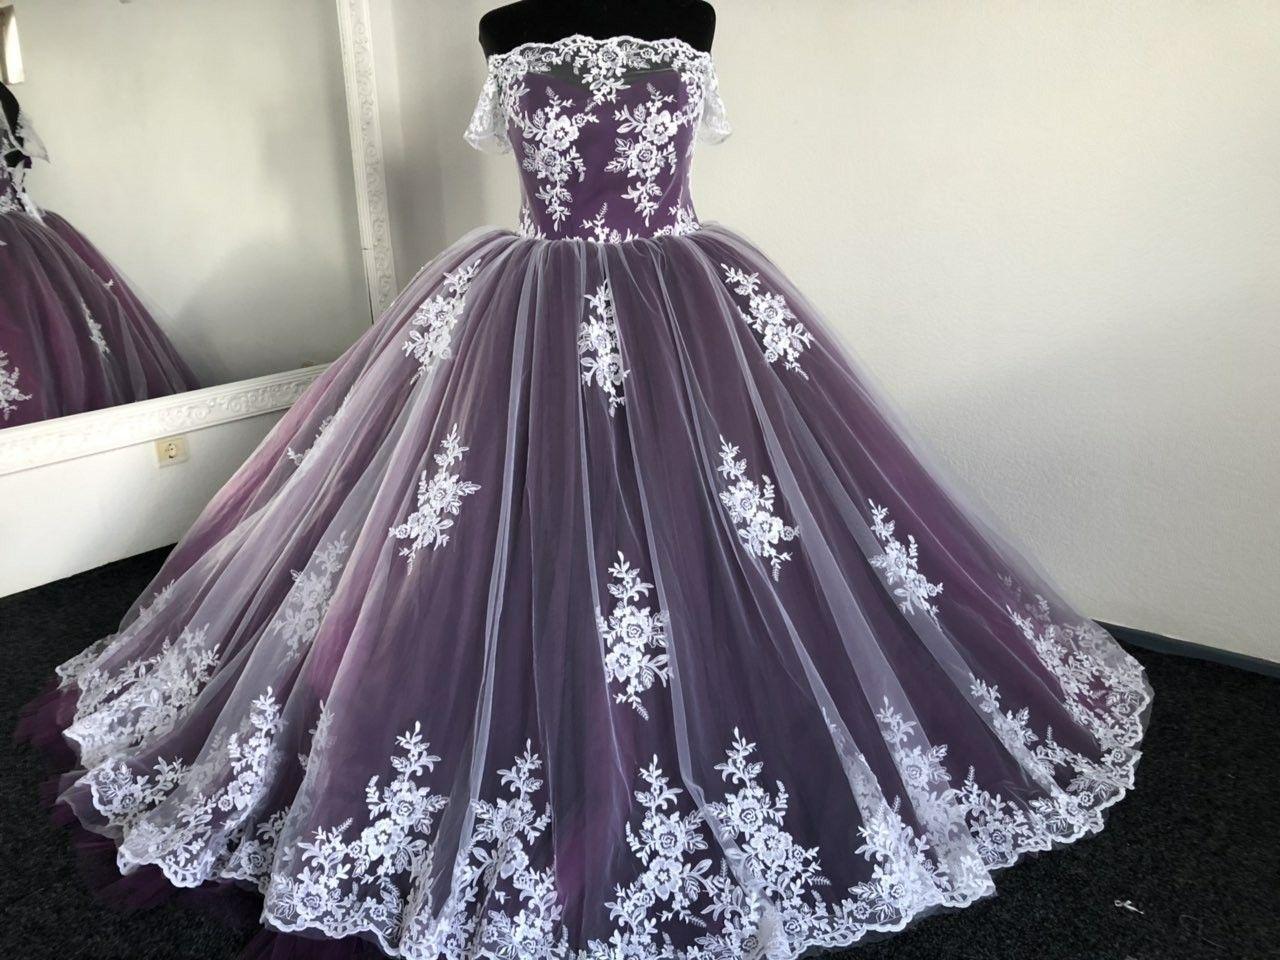 Purple Wedding Dress Gothic Wedding Dress Trail Wedding Dress Etsy In 2021 Purple Wedding Dress Purple Wedding Gown Etsy Wedding Dress [ 960 x 1280 Pixel ]